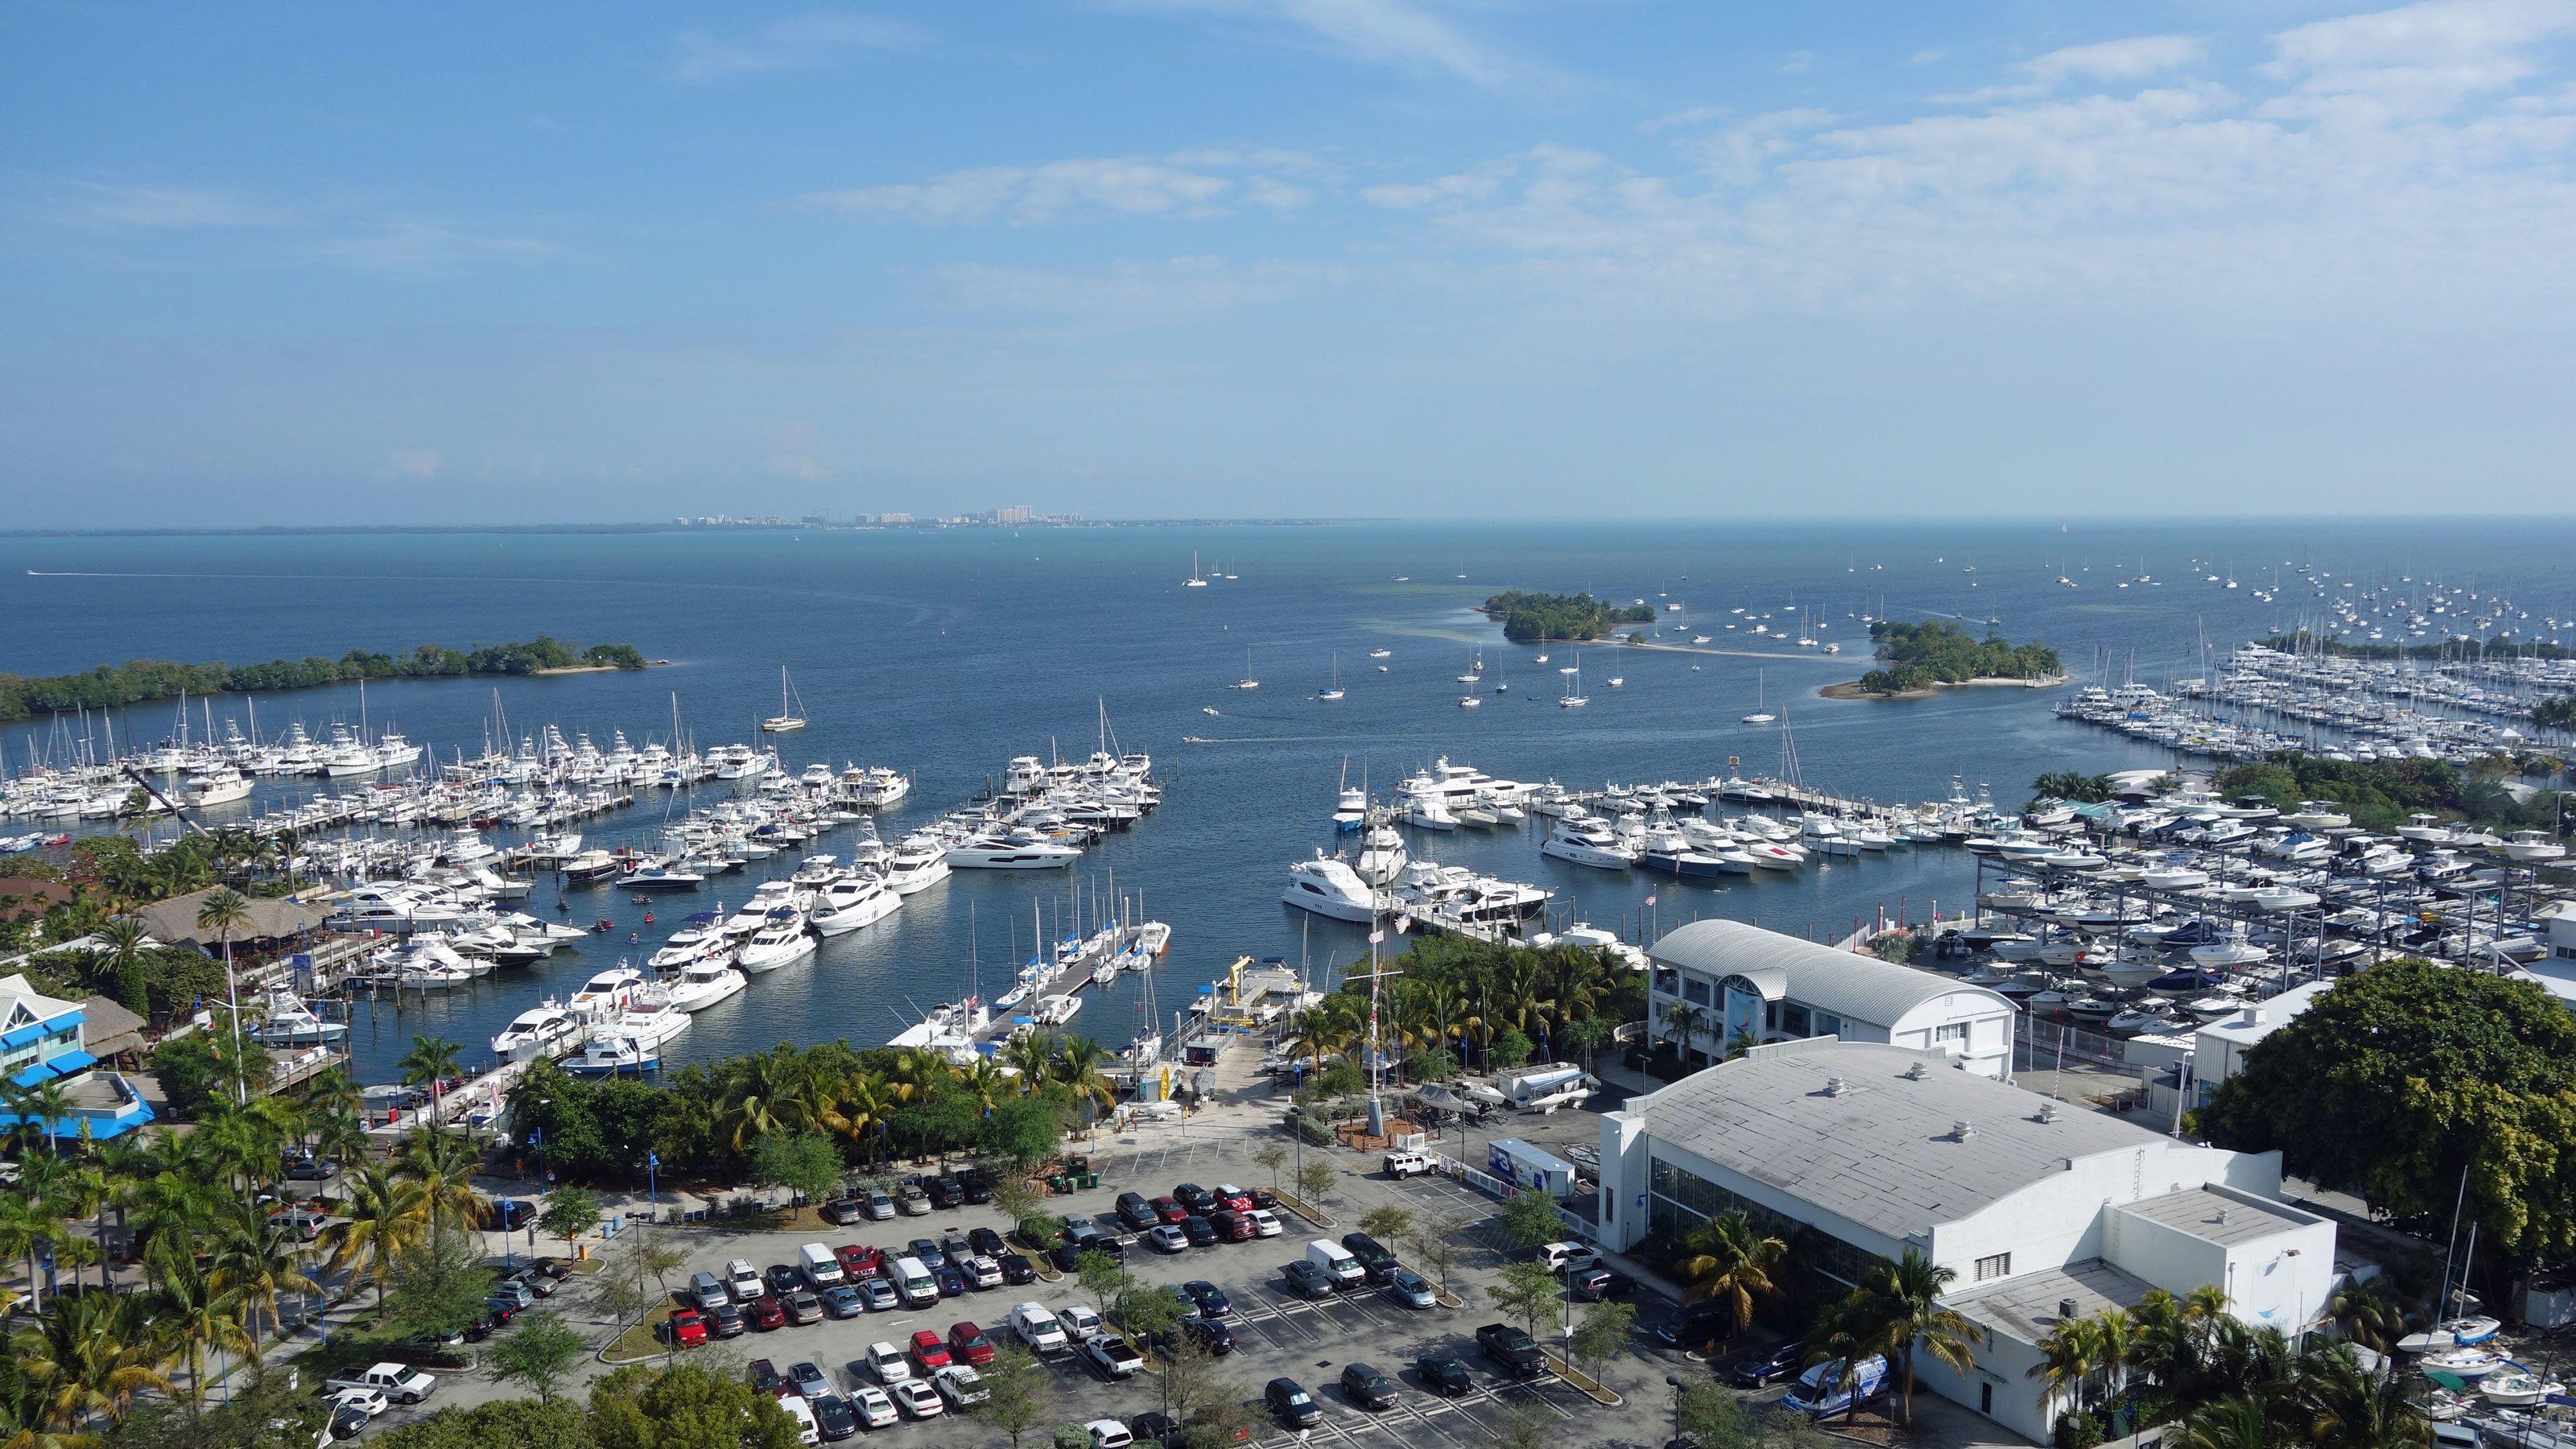 Boating docks at Key West